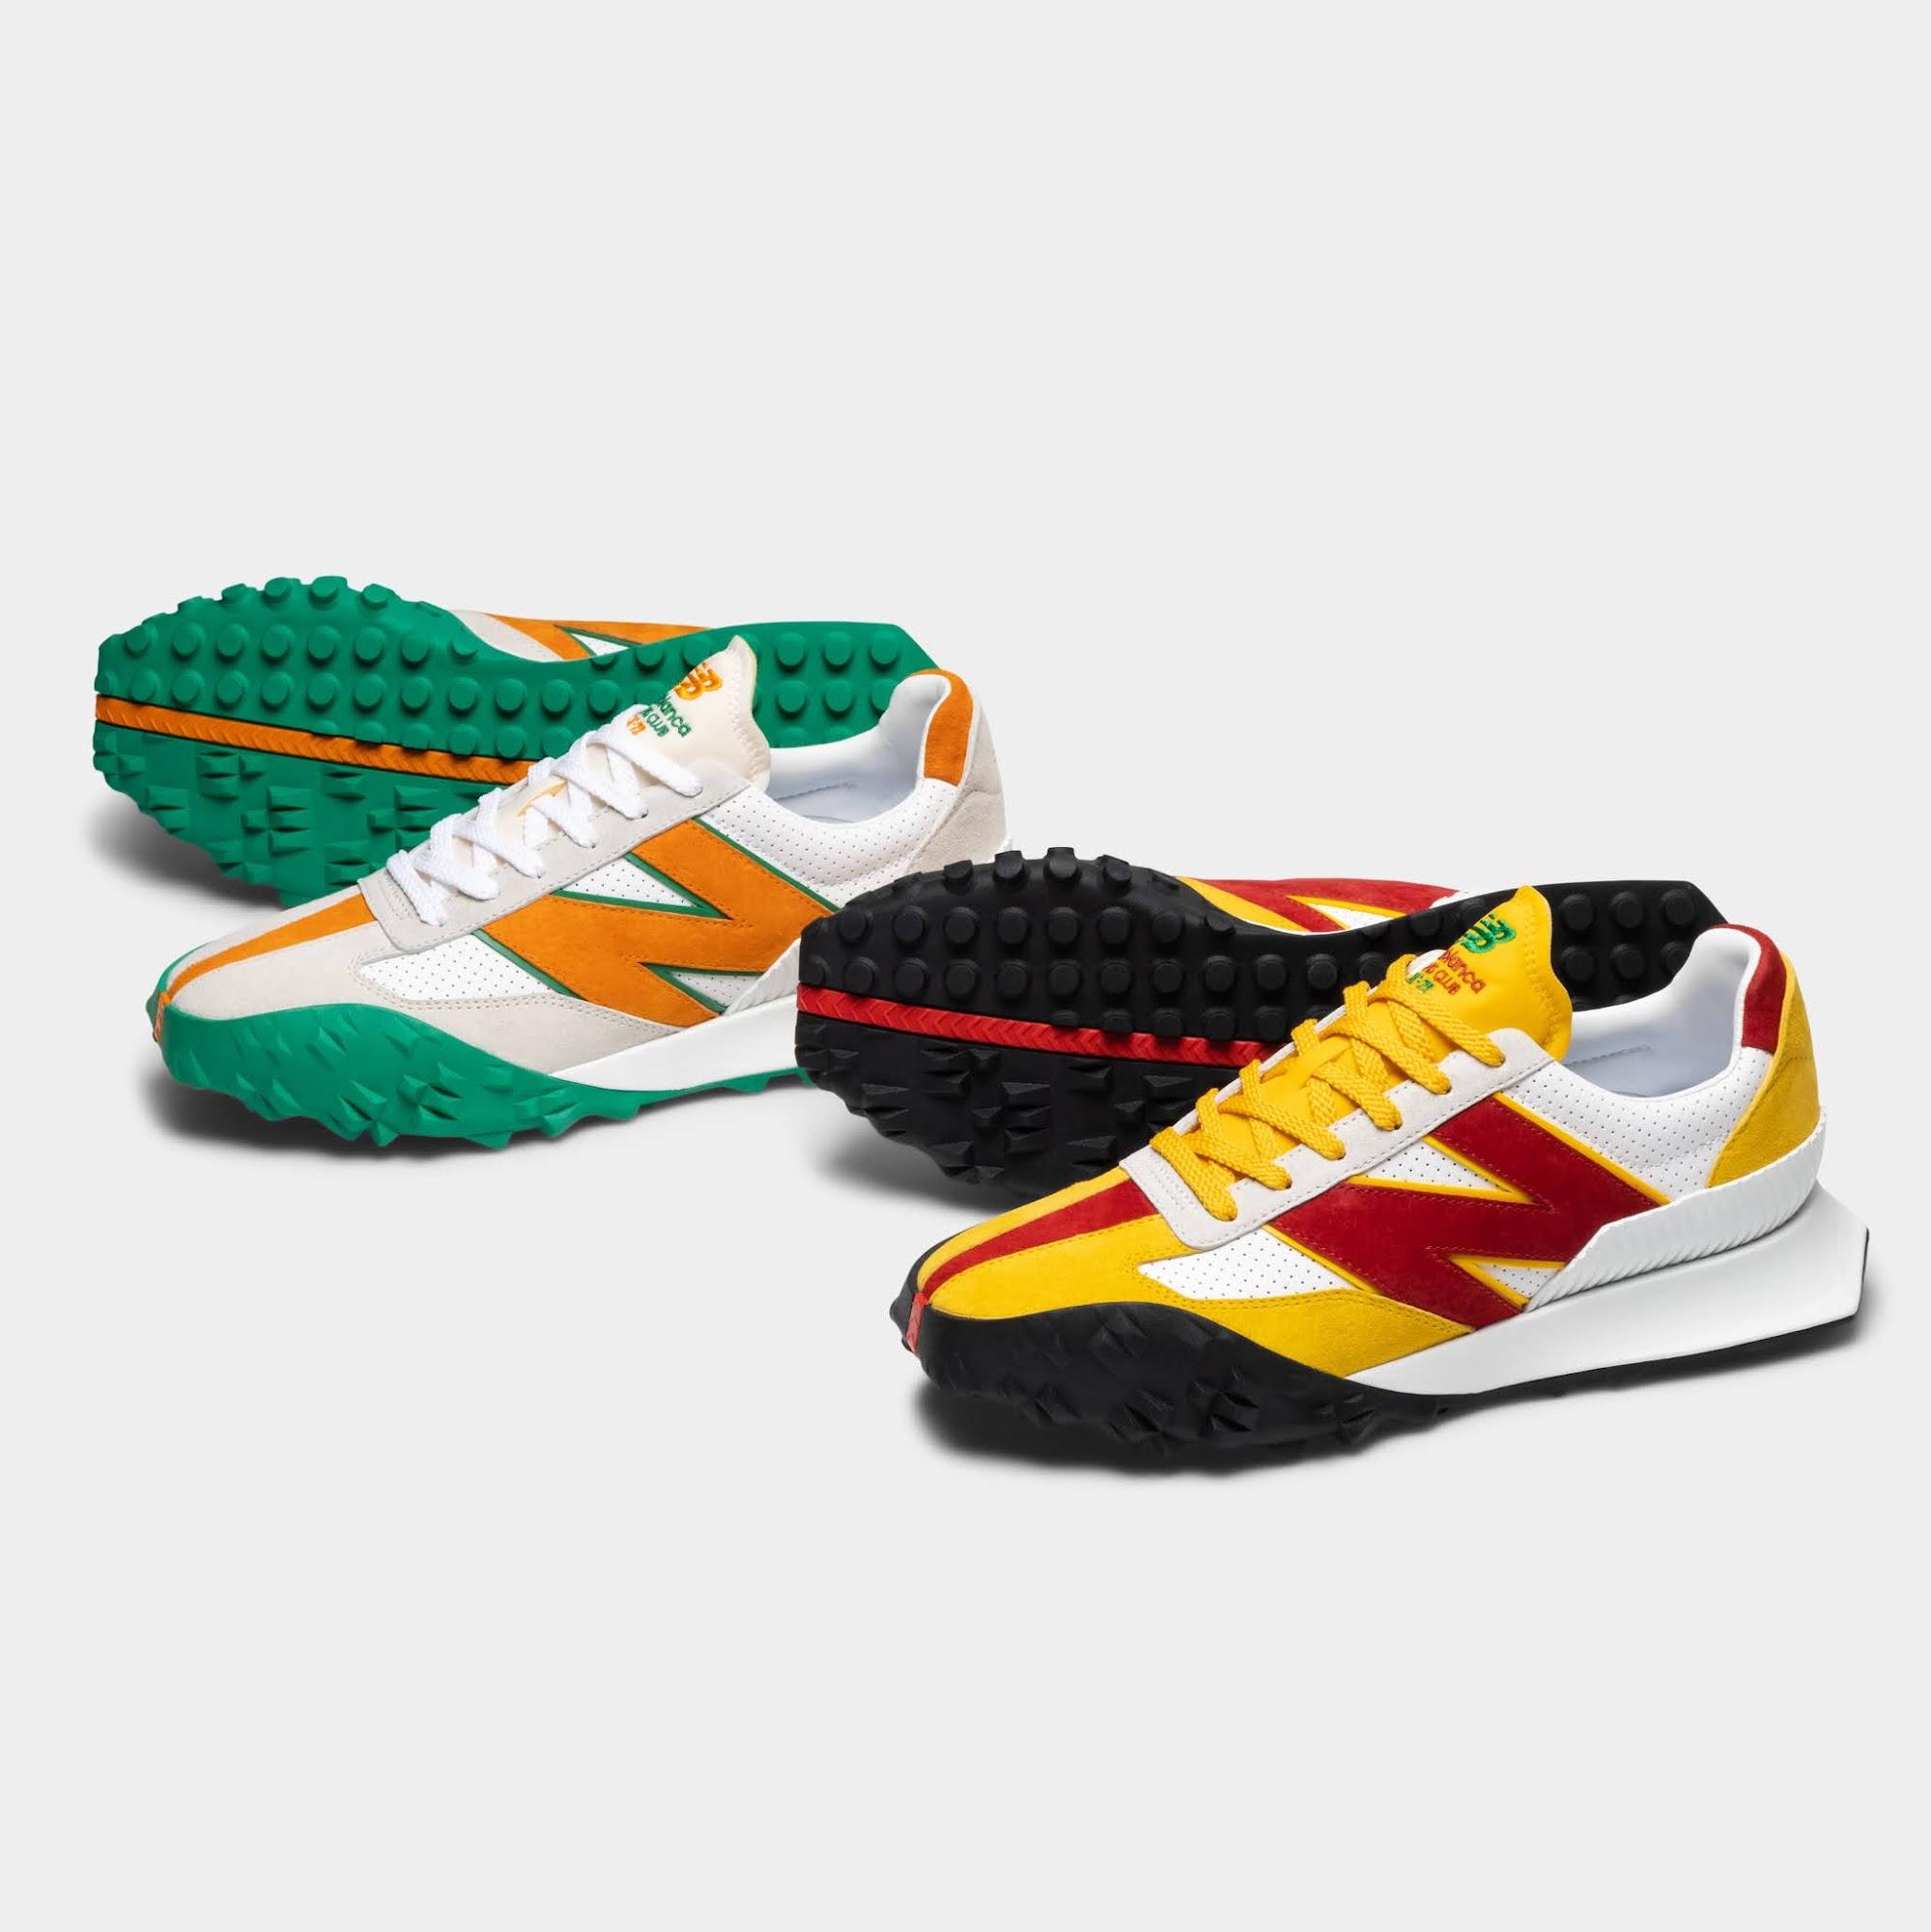 Zapatillas Casablanca XC-72 de New Balance